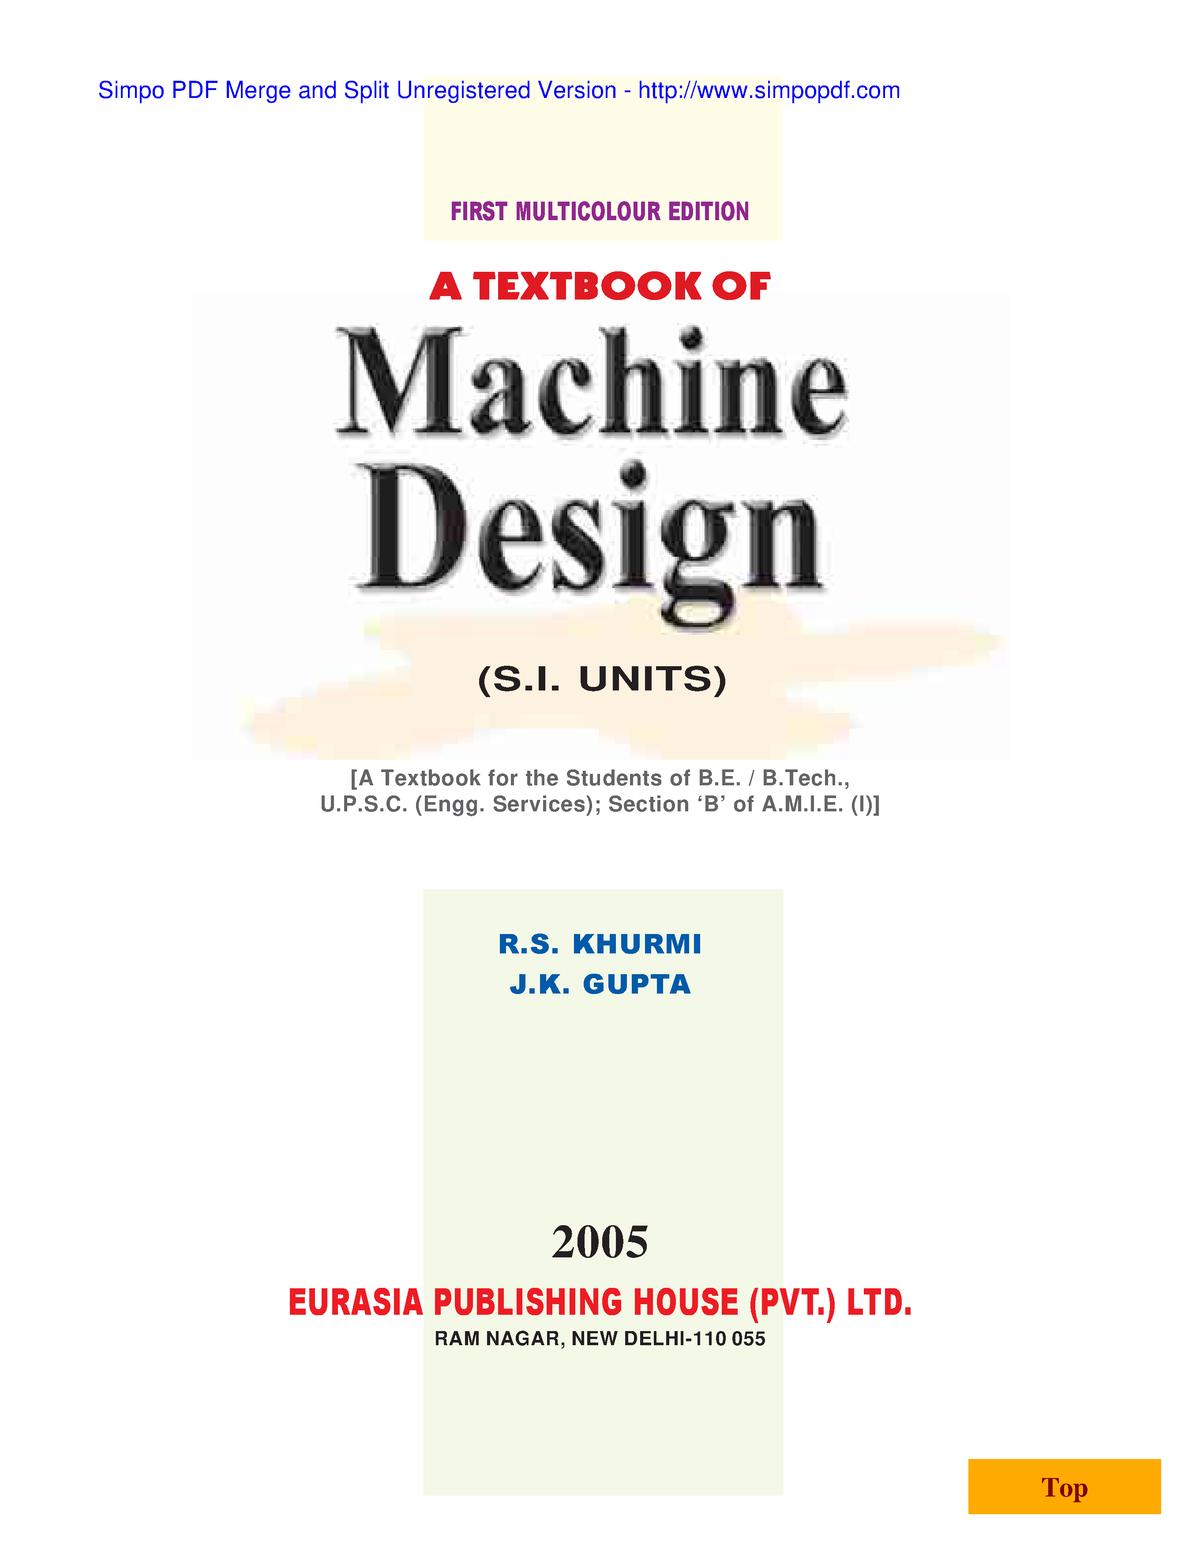 A textbook of machine design khurmi gupta - bdd: Mechanical